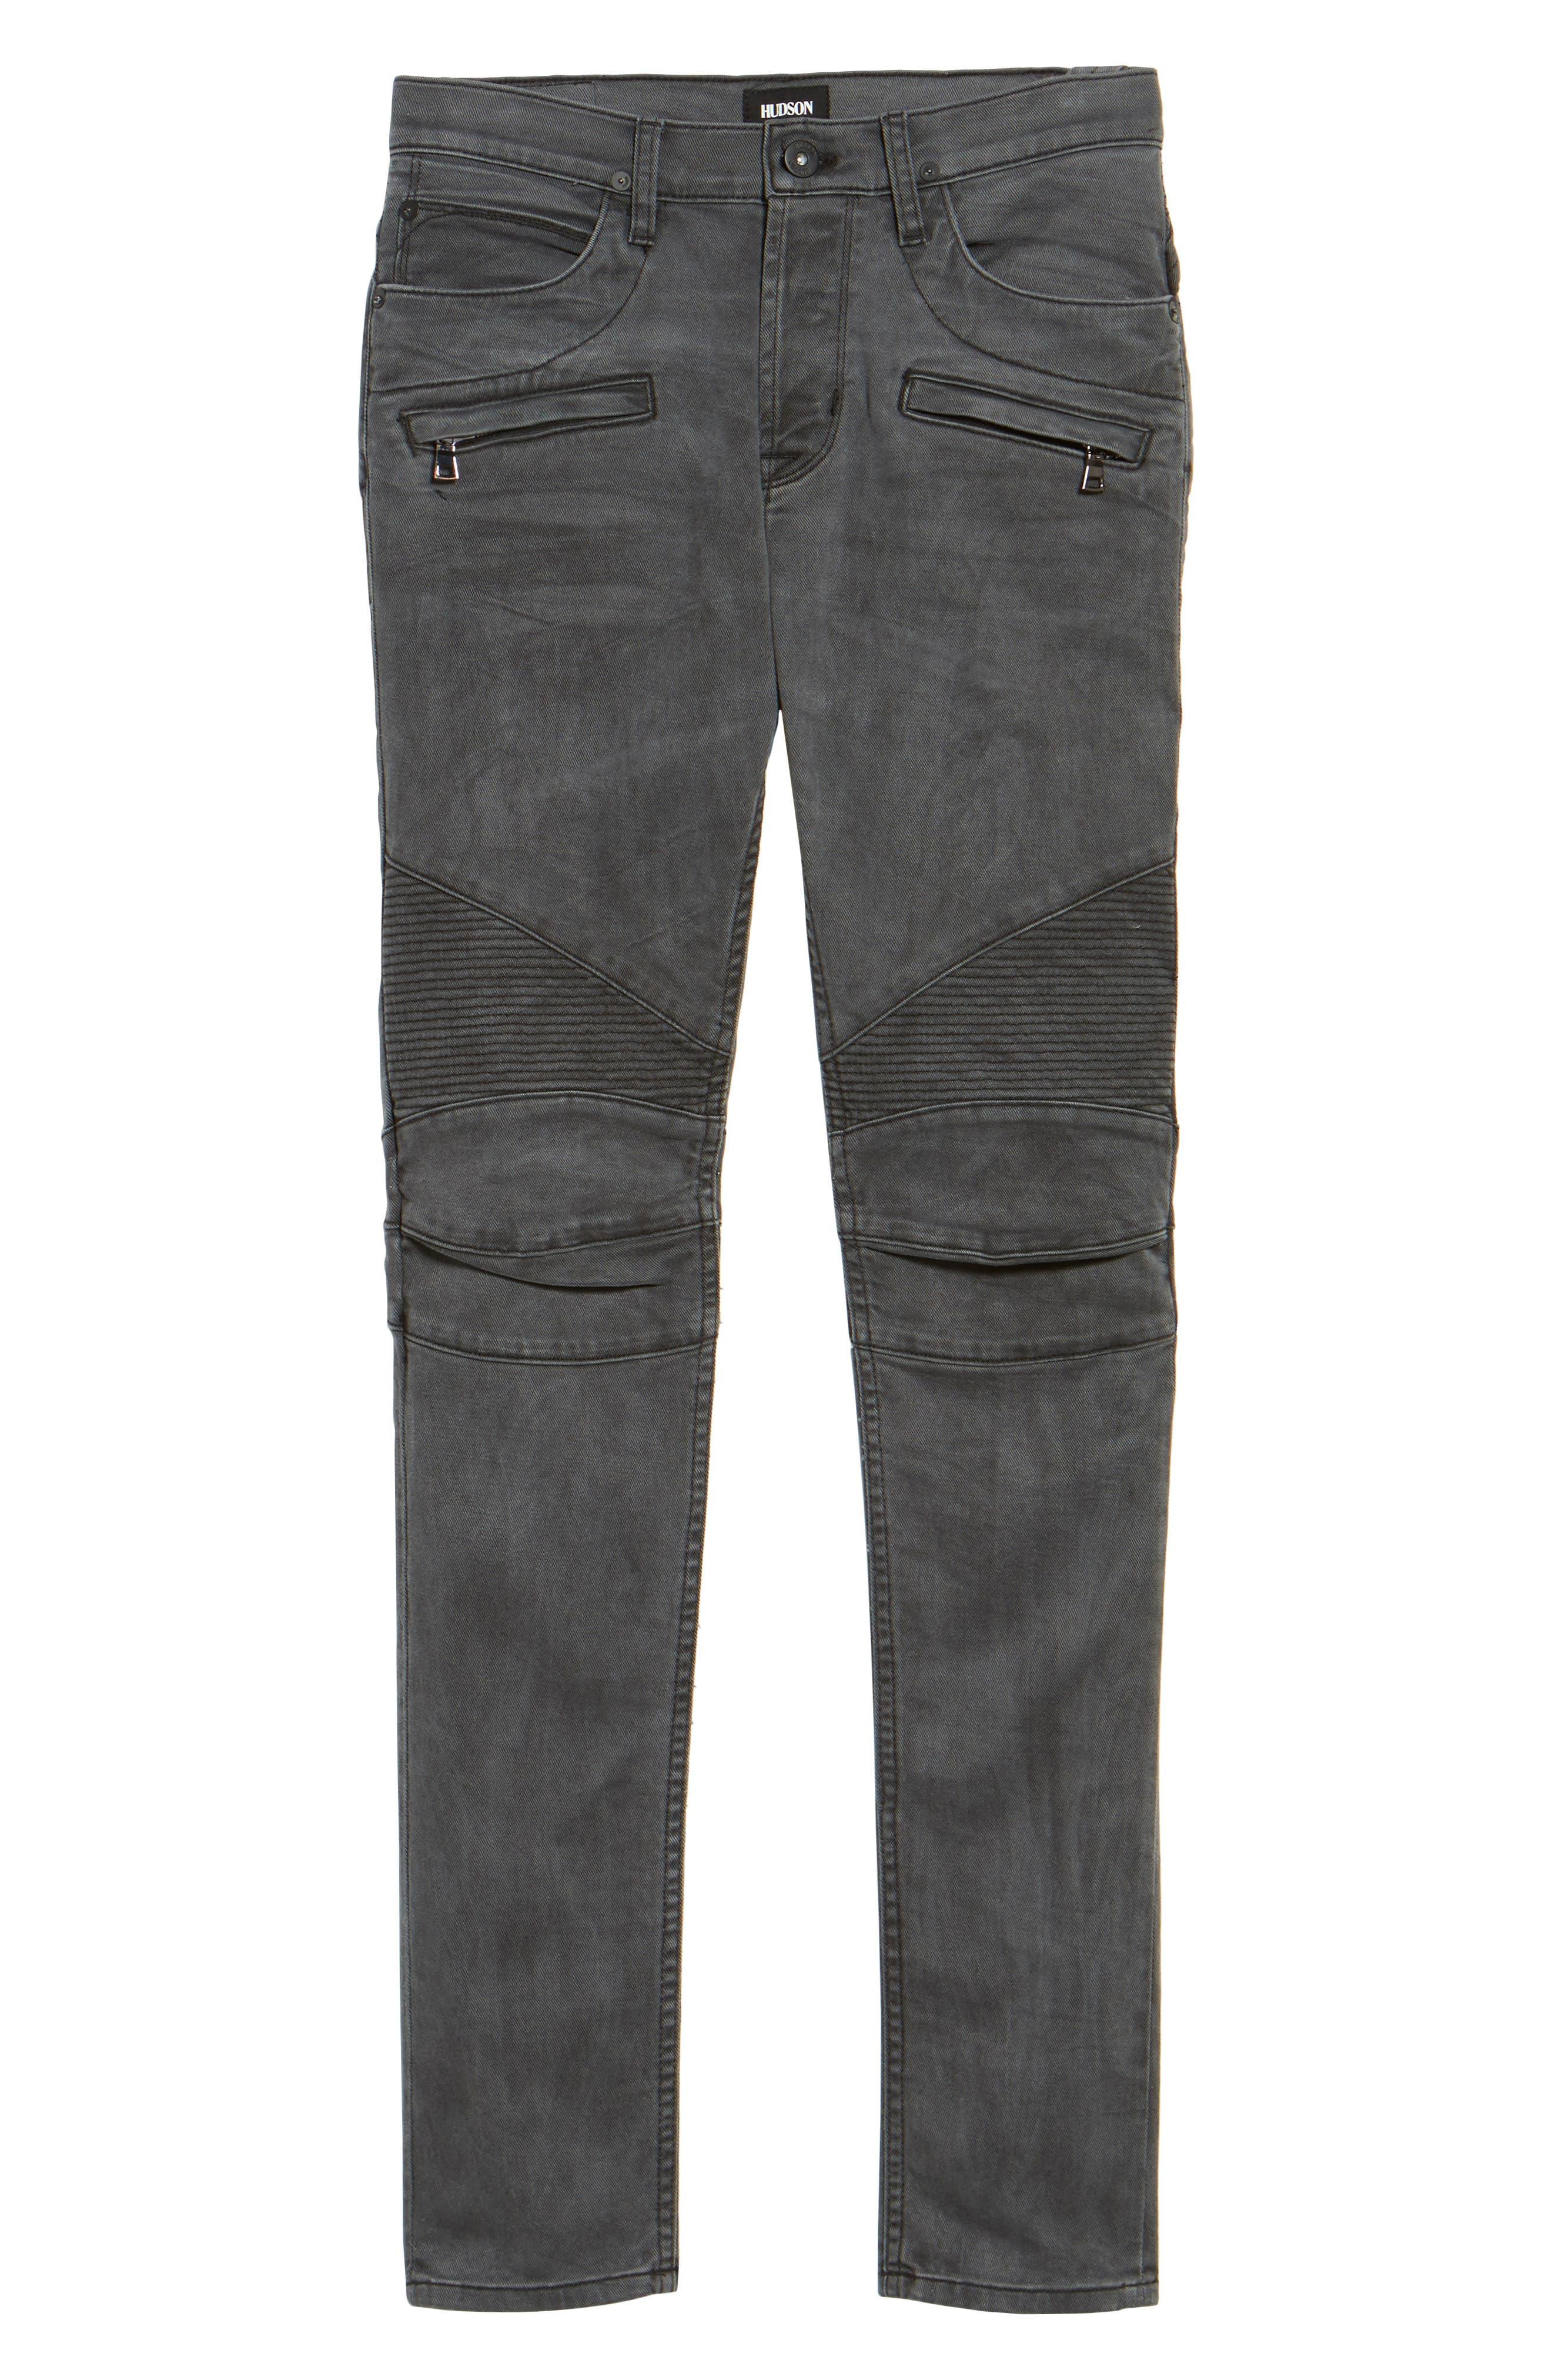 Blinder Biker Moto Skinny Fit Jeans,                             Alternate thumbnail 6, color,                             MIXTAPE